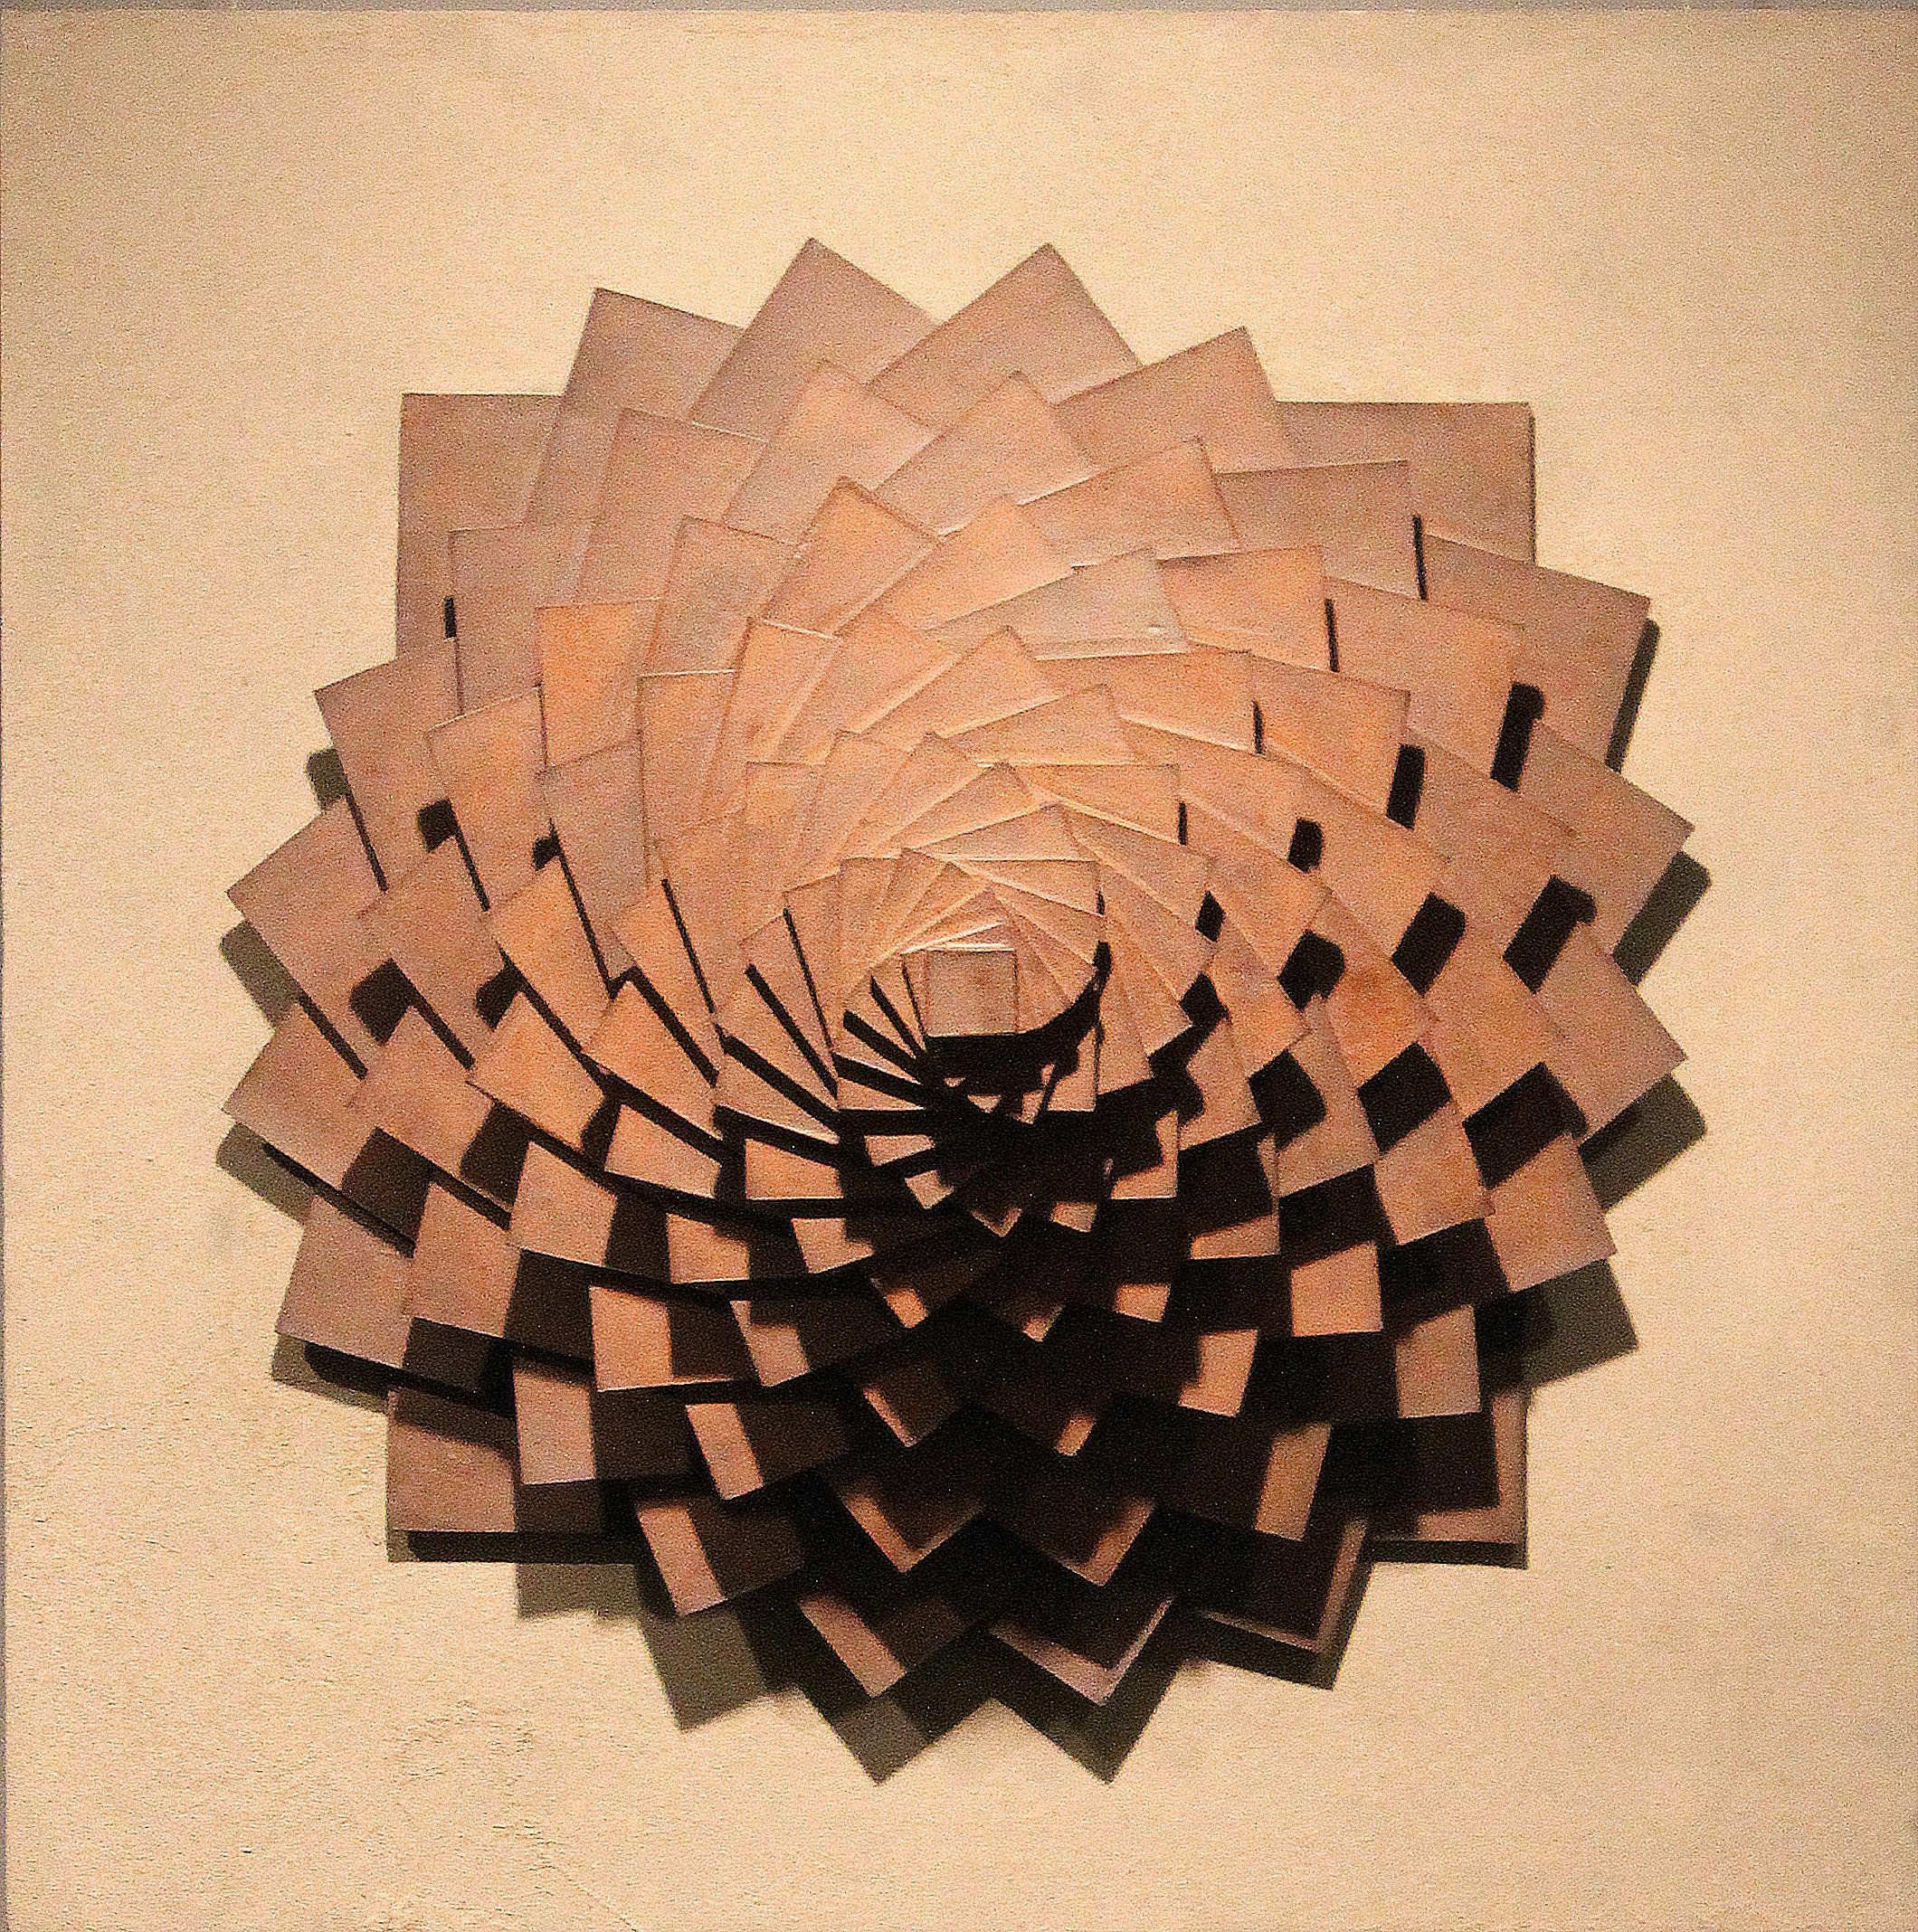 Harmonic Geometry I  |  25 x 25 x 12 inches  | Stoneware, Stained birch, Sand  |  2015